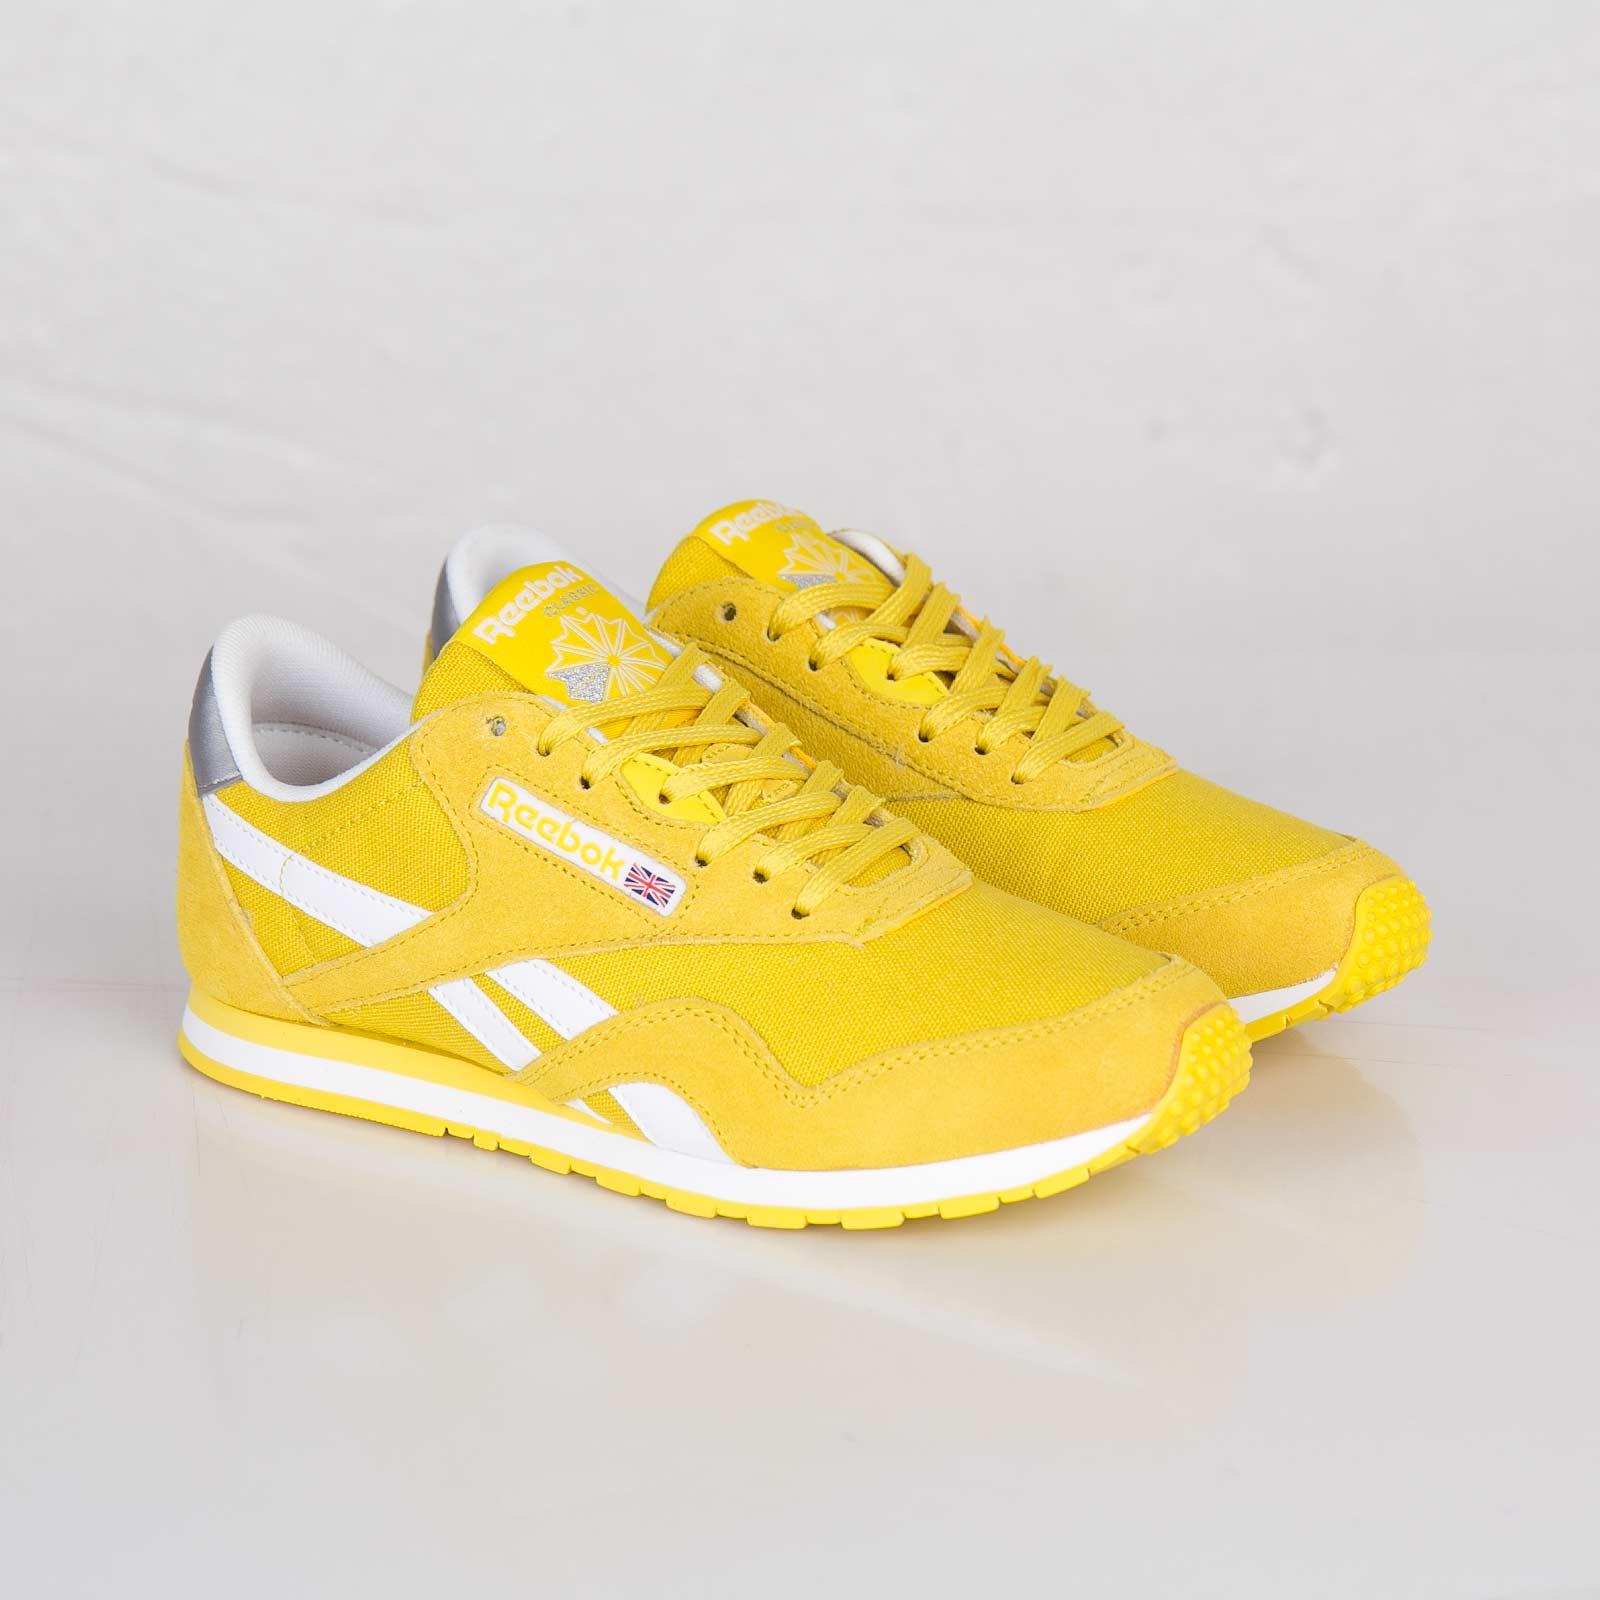 Reebok Classic Nylon Slim Pop - V55274 - Sneakersnstuff  f69cc17fe